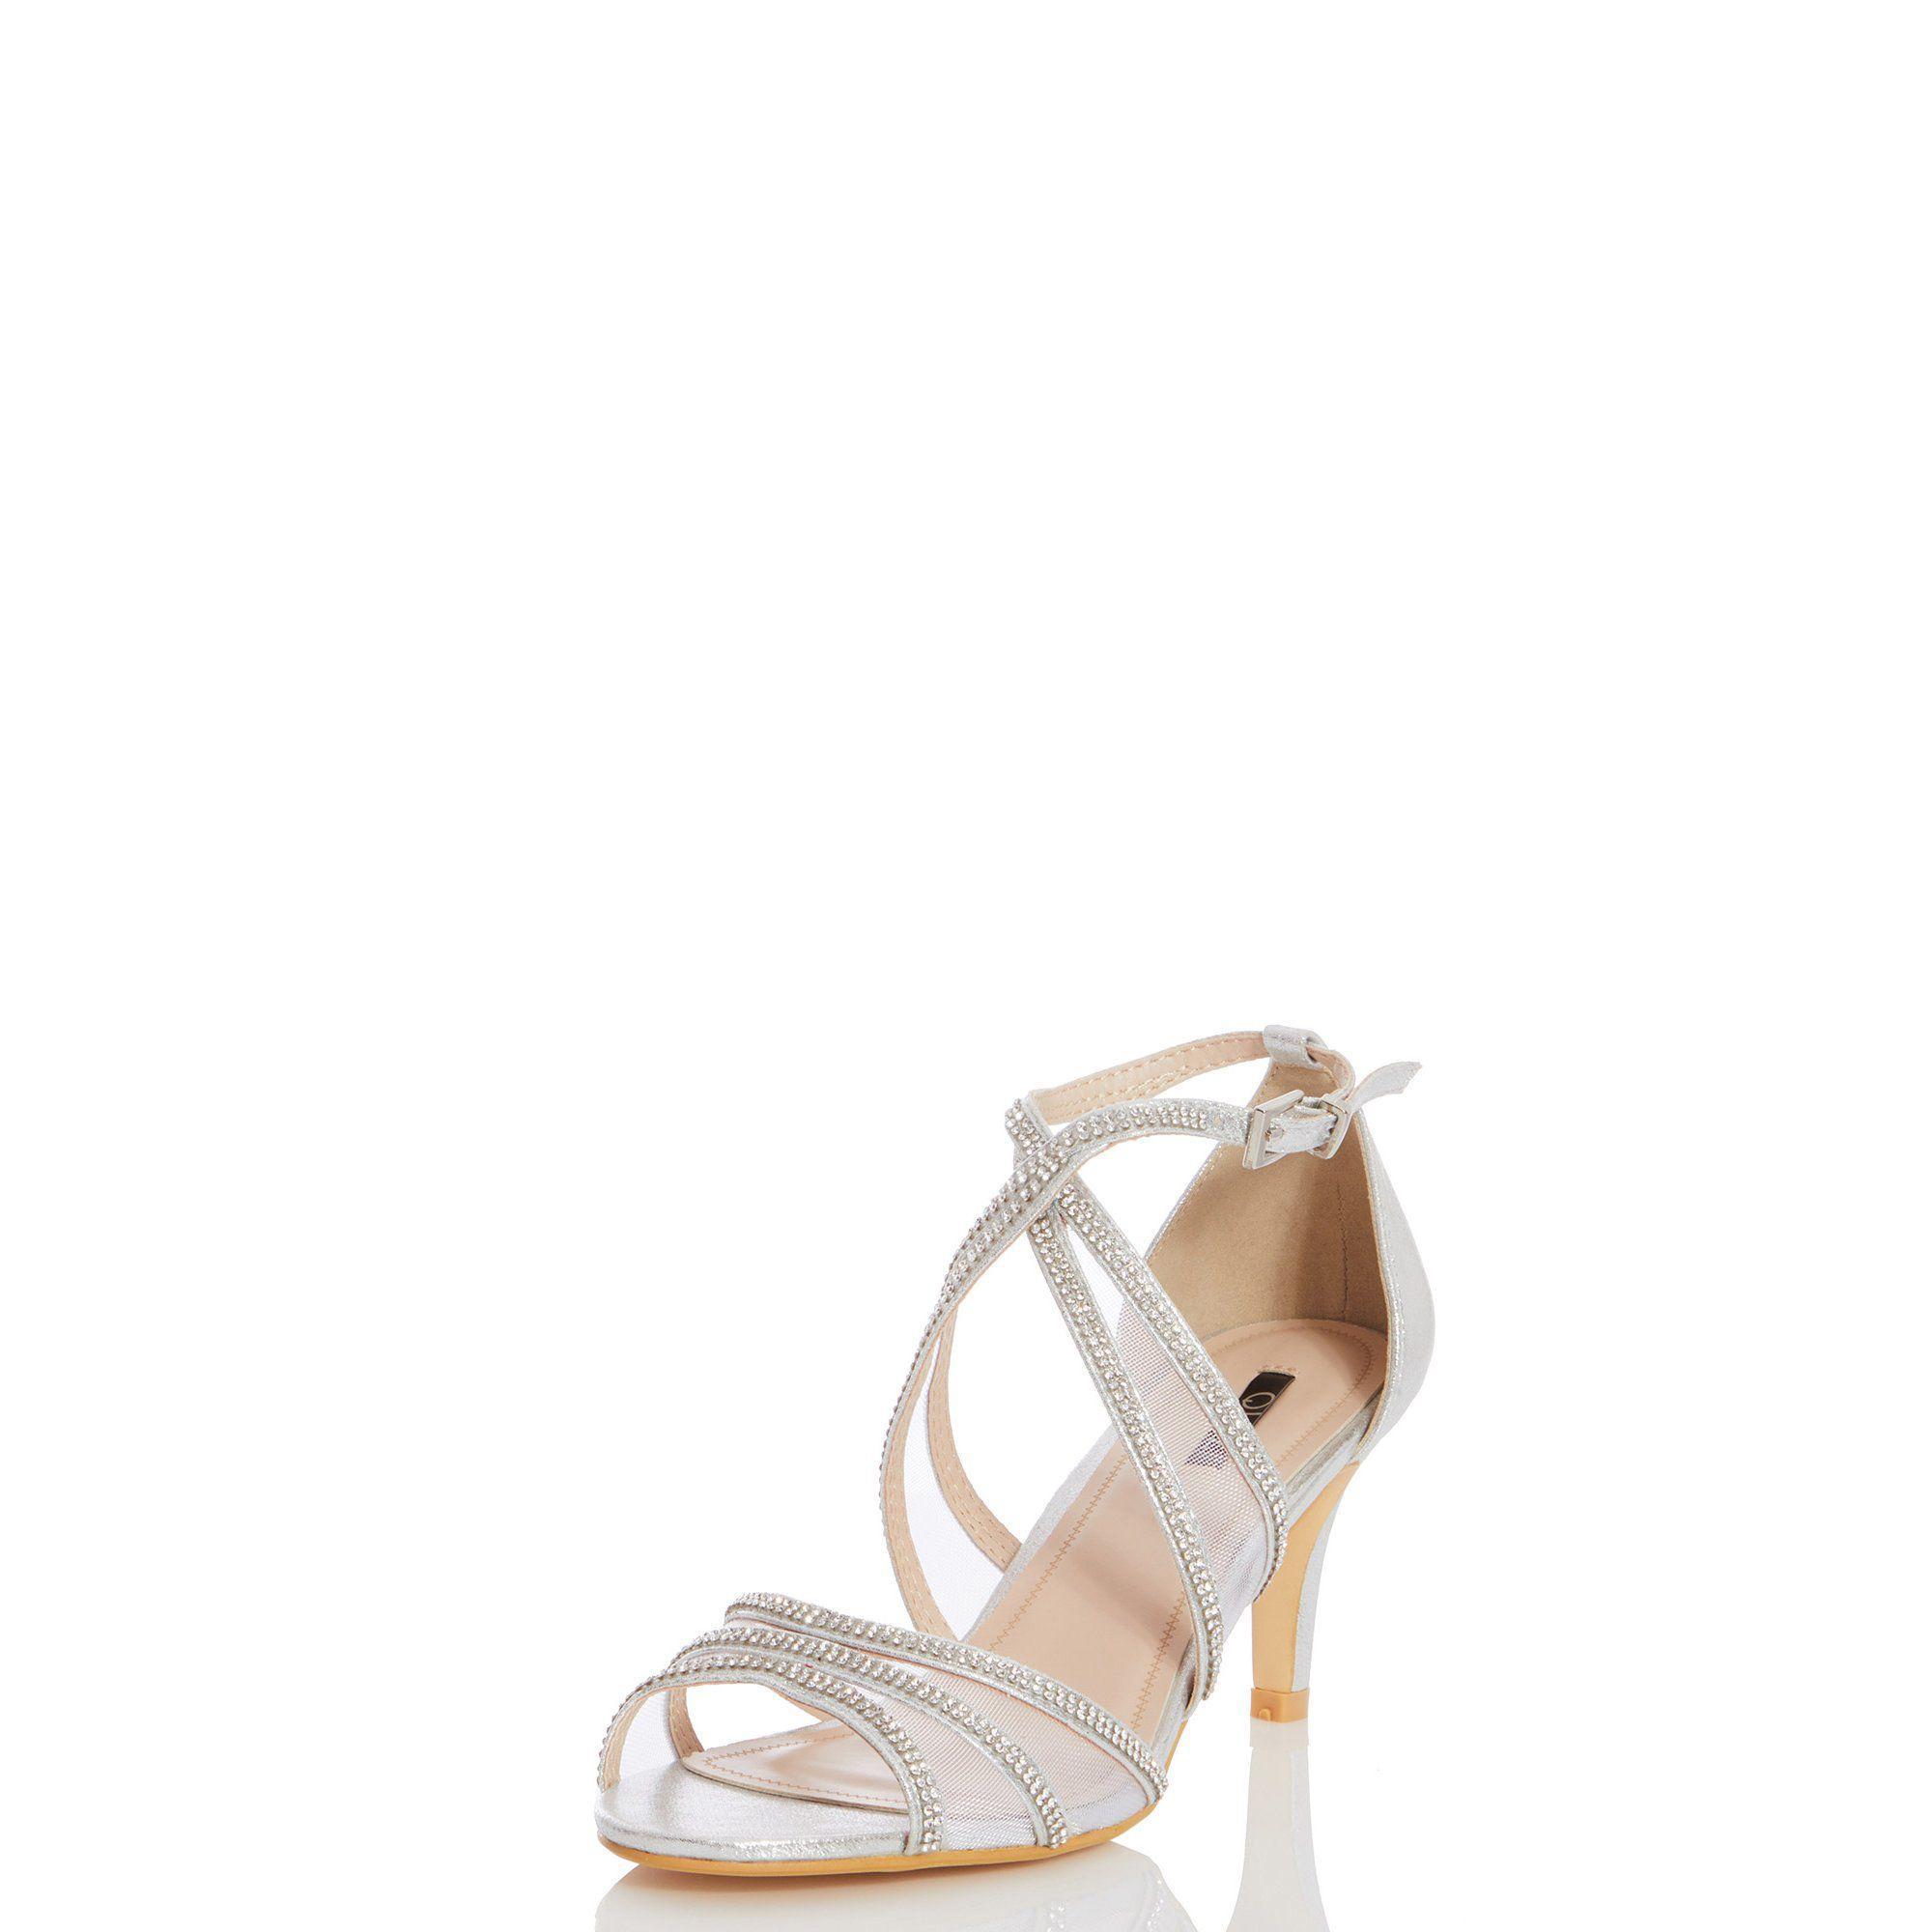 633f214135f Quiz - Metallic Silver Shimmer Diamante Low Heel Sandals - Lyst. View  fullscreen